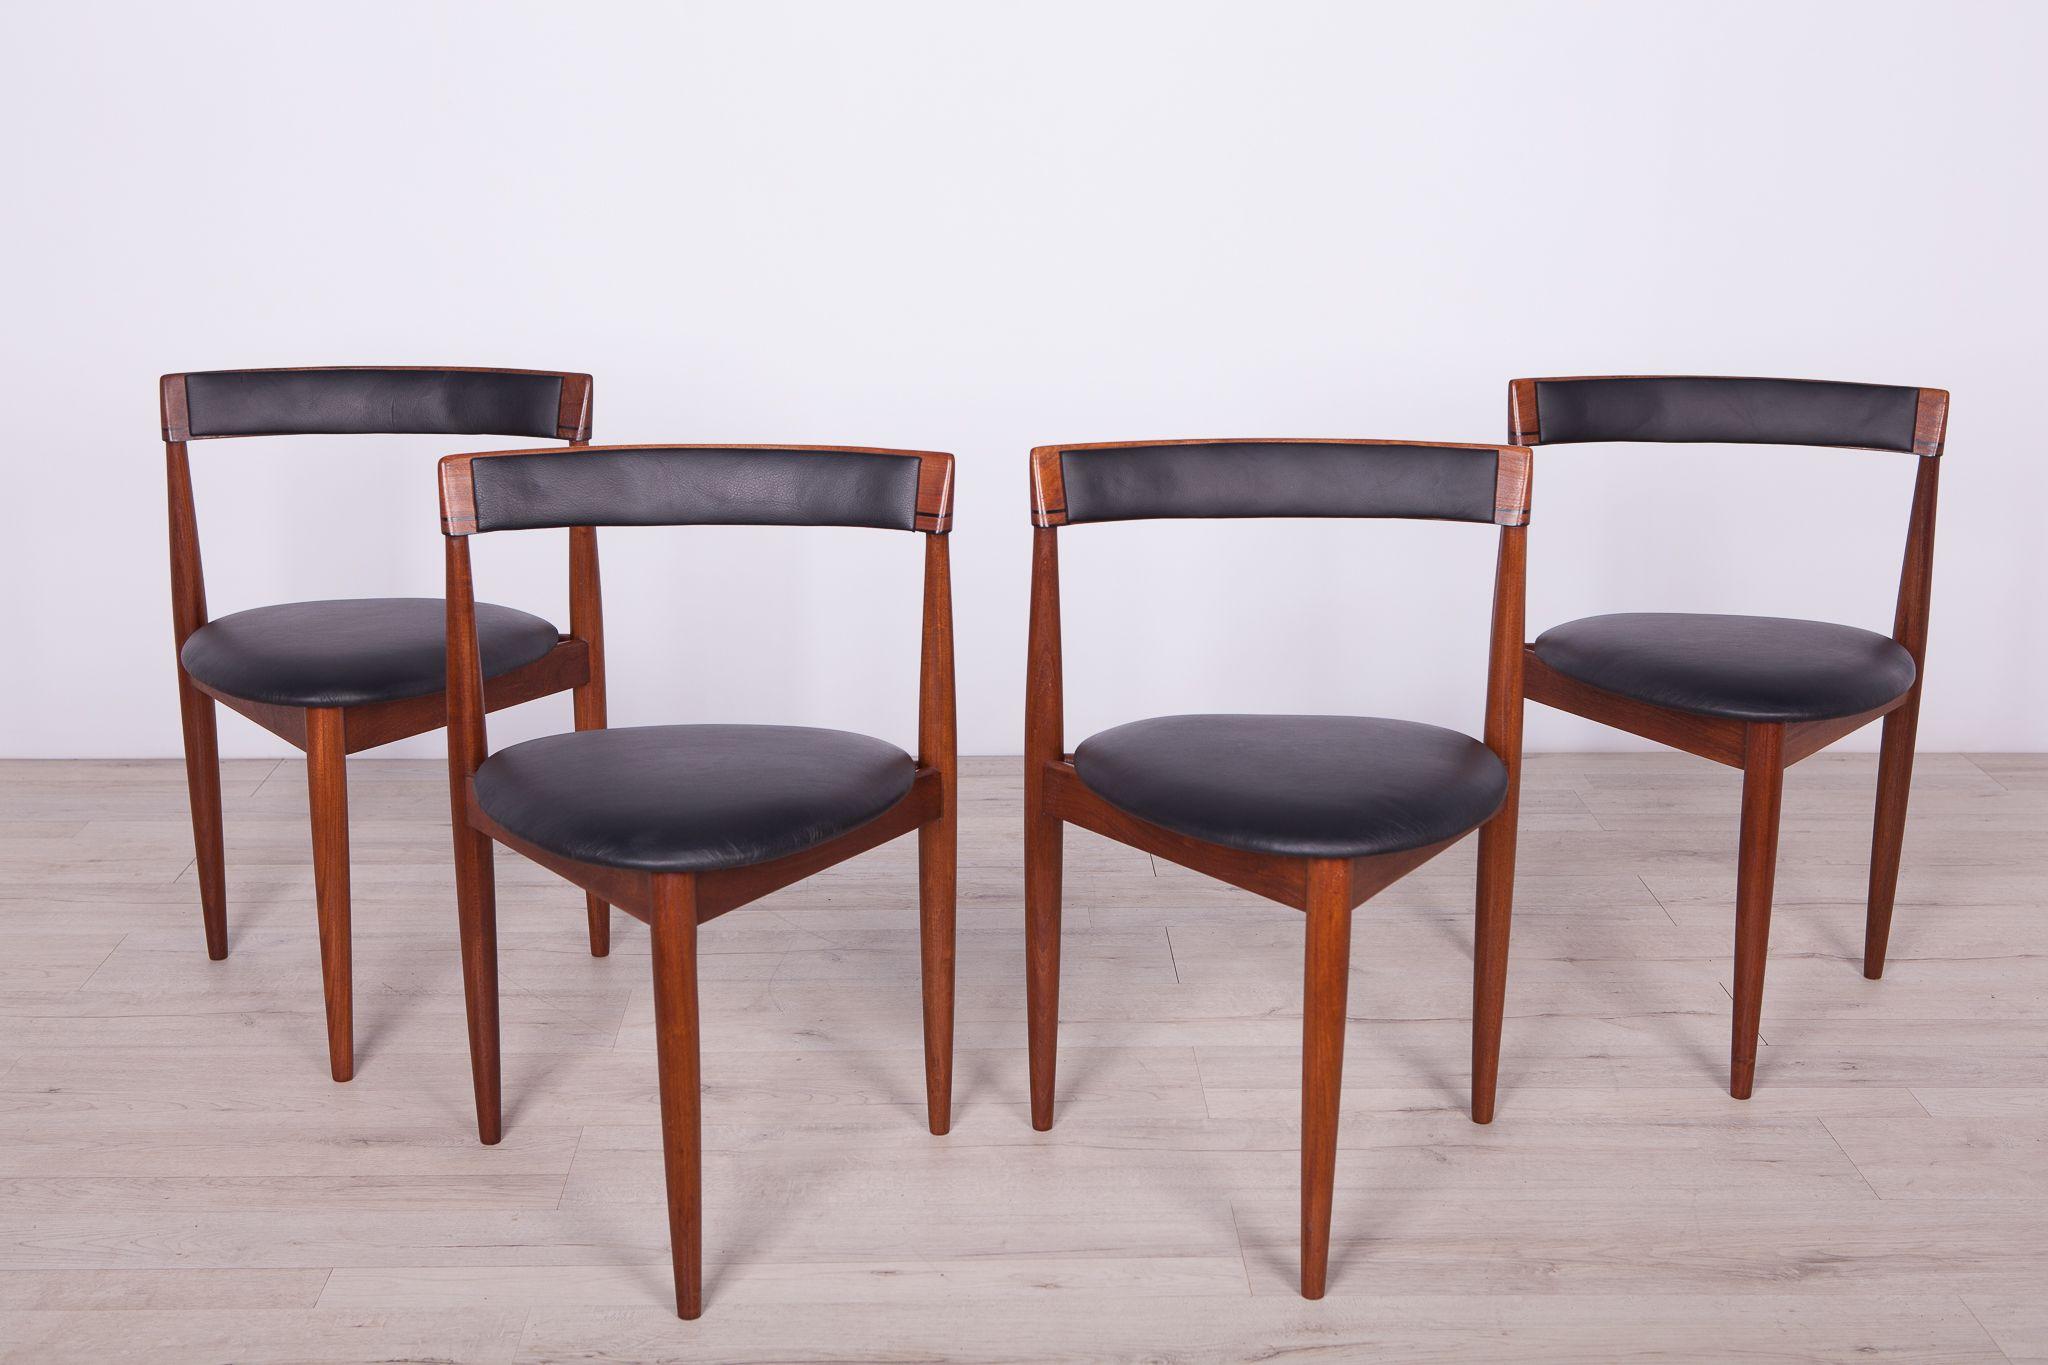 Teak Dining Table 4 Chairs Set By Hans Olsen For Frem Rojle 1950s Design Market